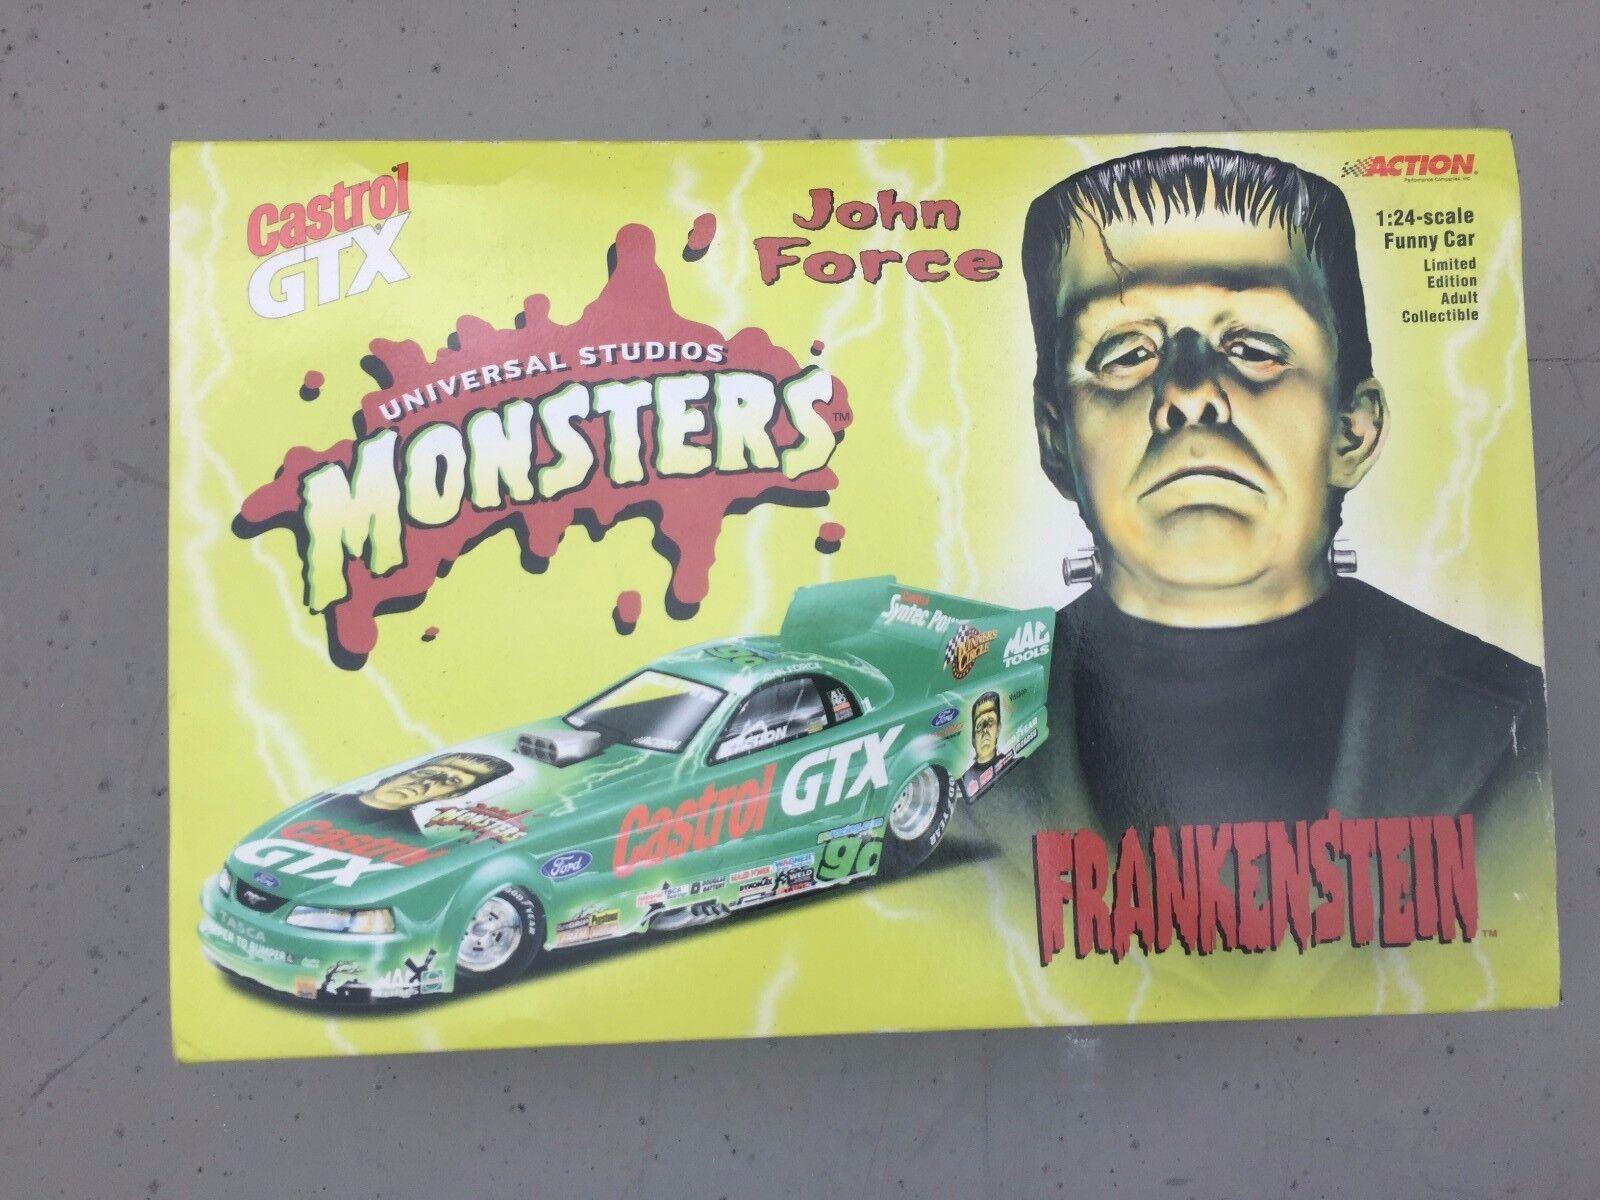 envío gratuito a nivel mundial John Force 2000 Frankenstein Ford Ford Ford Mustang Castrol GTX 1 24th scale  las mejores marcas venden barato